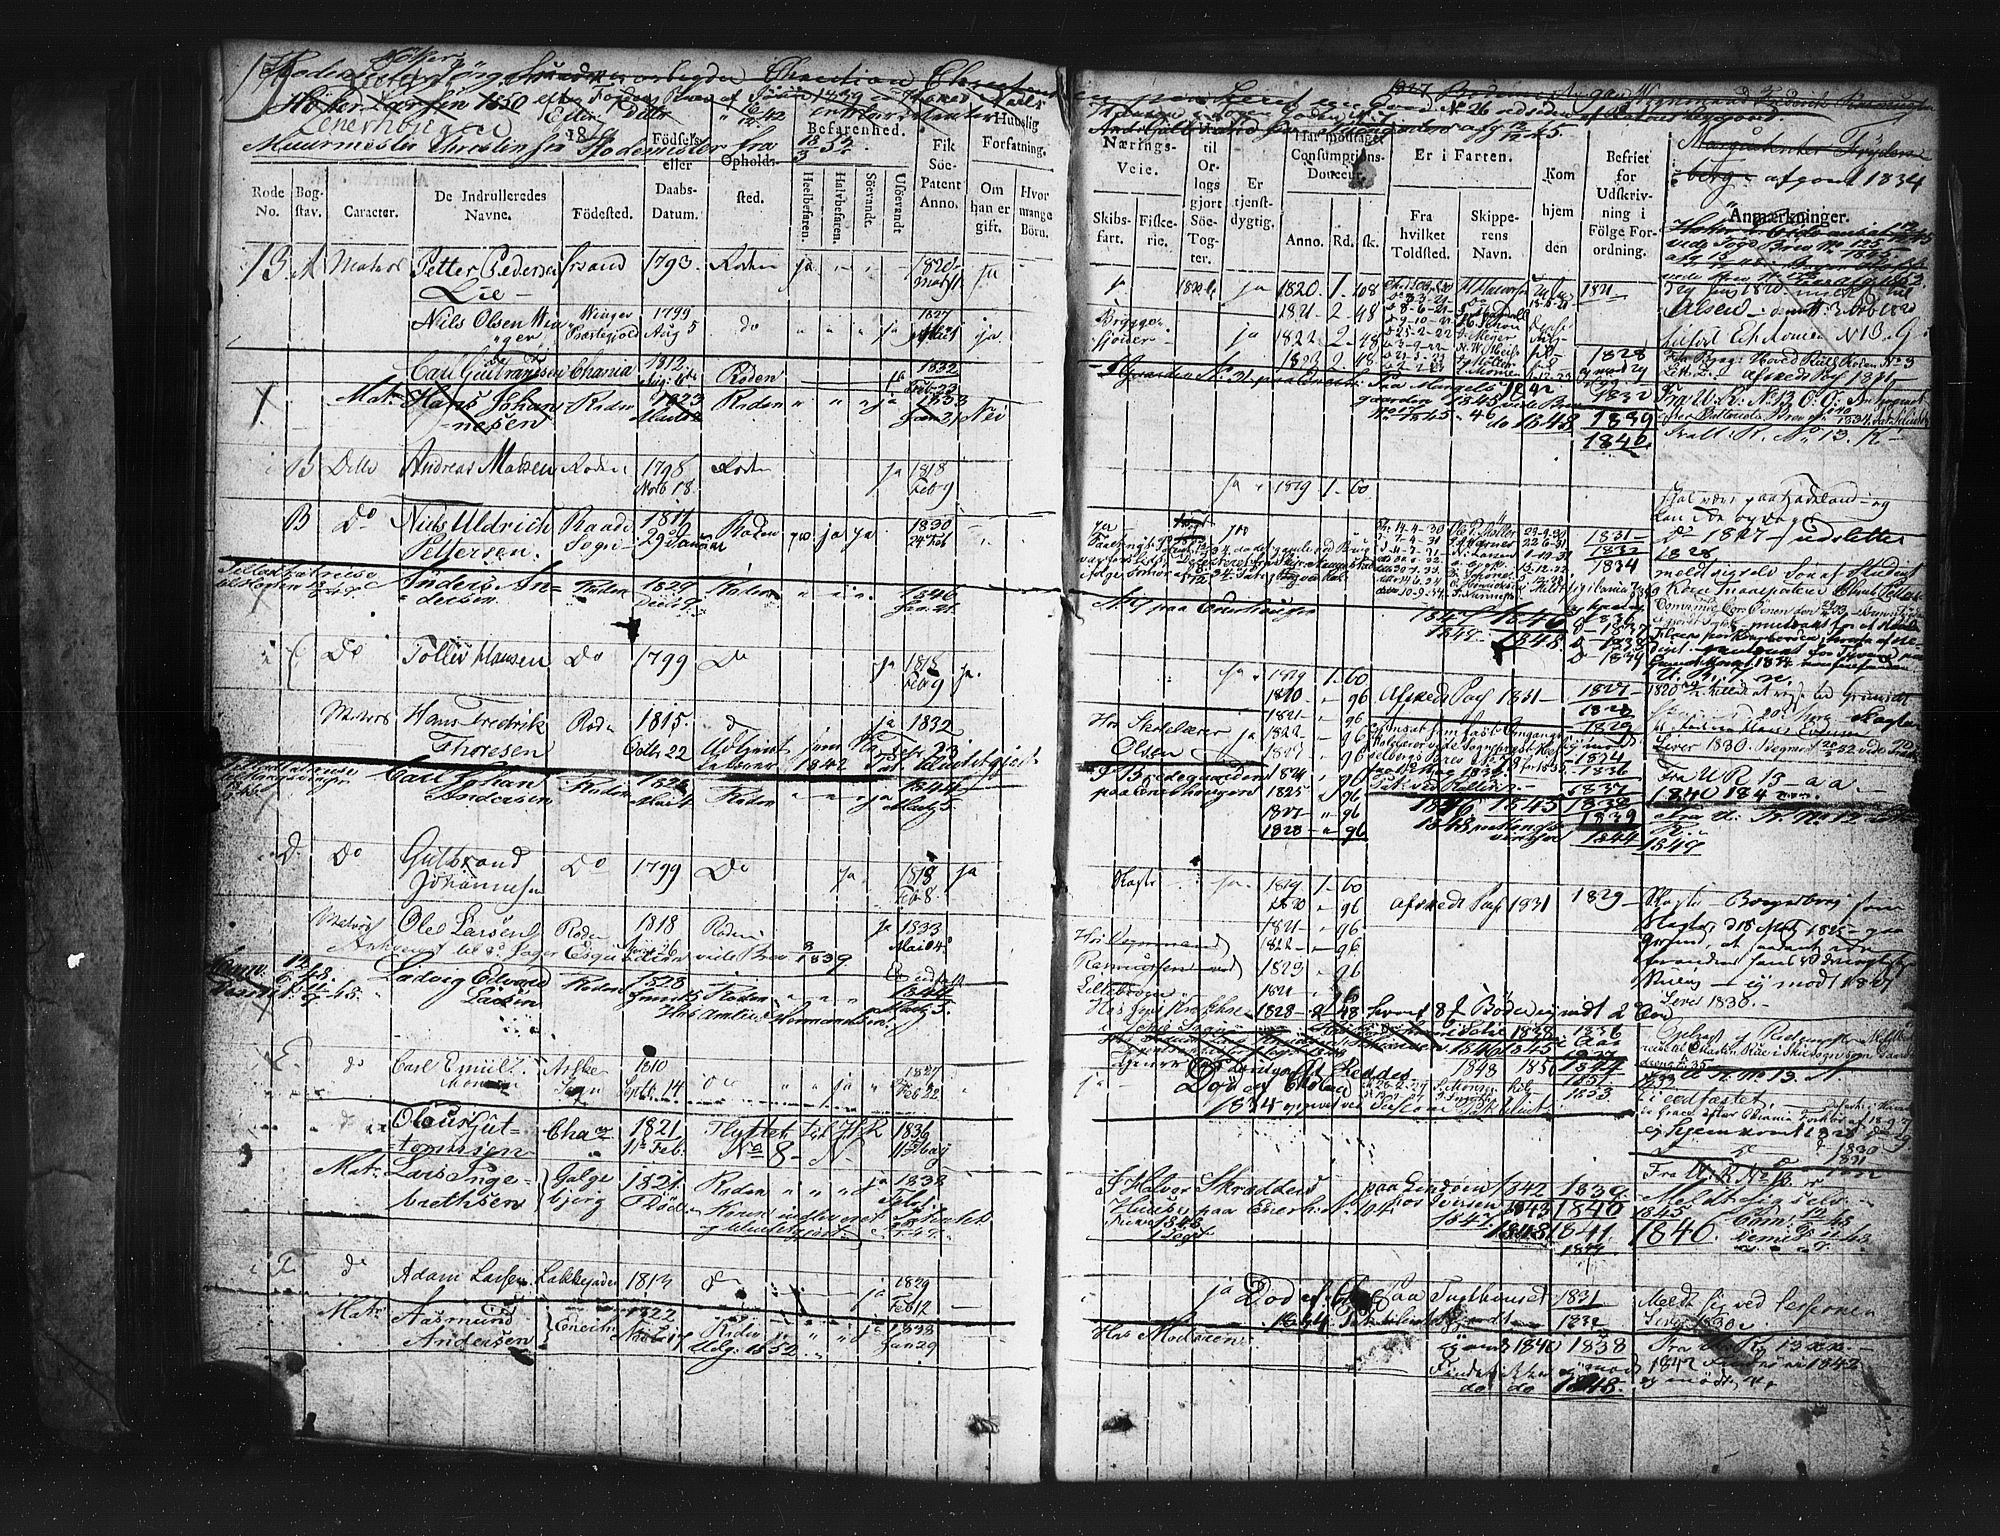 SAO, Oslo mønstringskontor, F/Fc/Fcb/L0001: Hovedrulle, 1819, s. 179